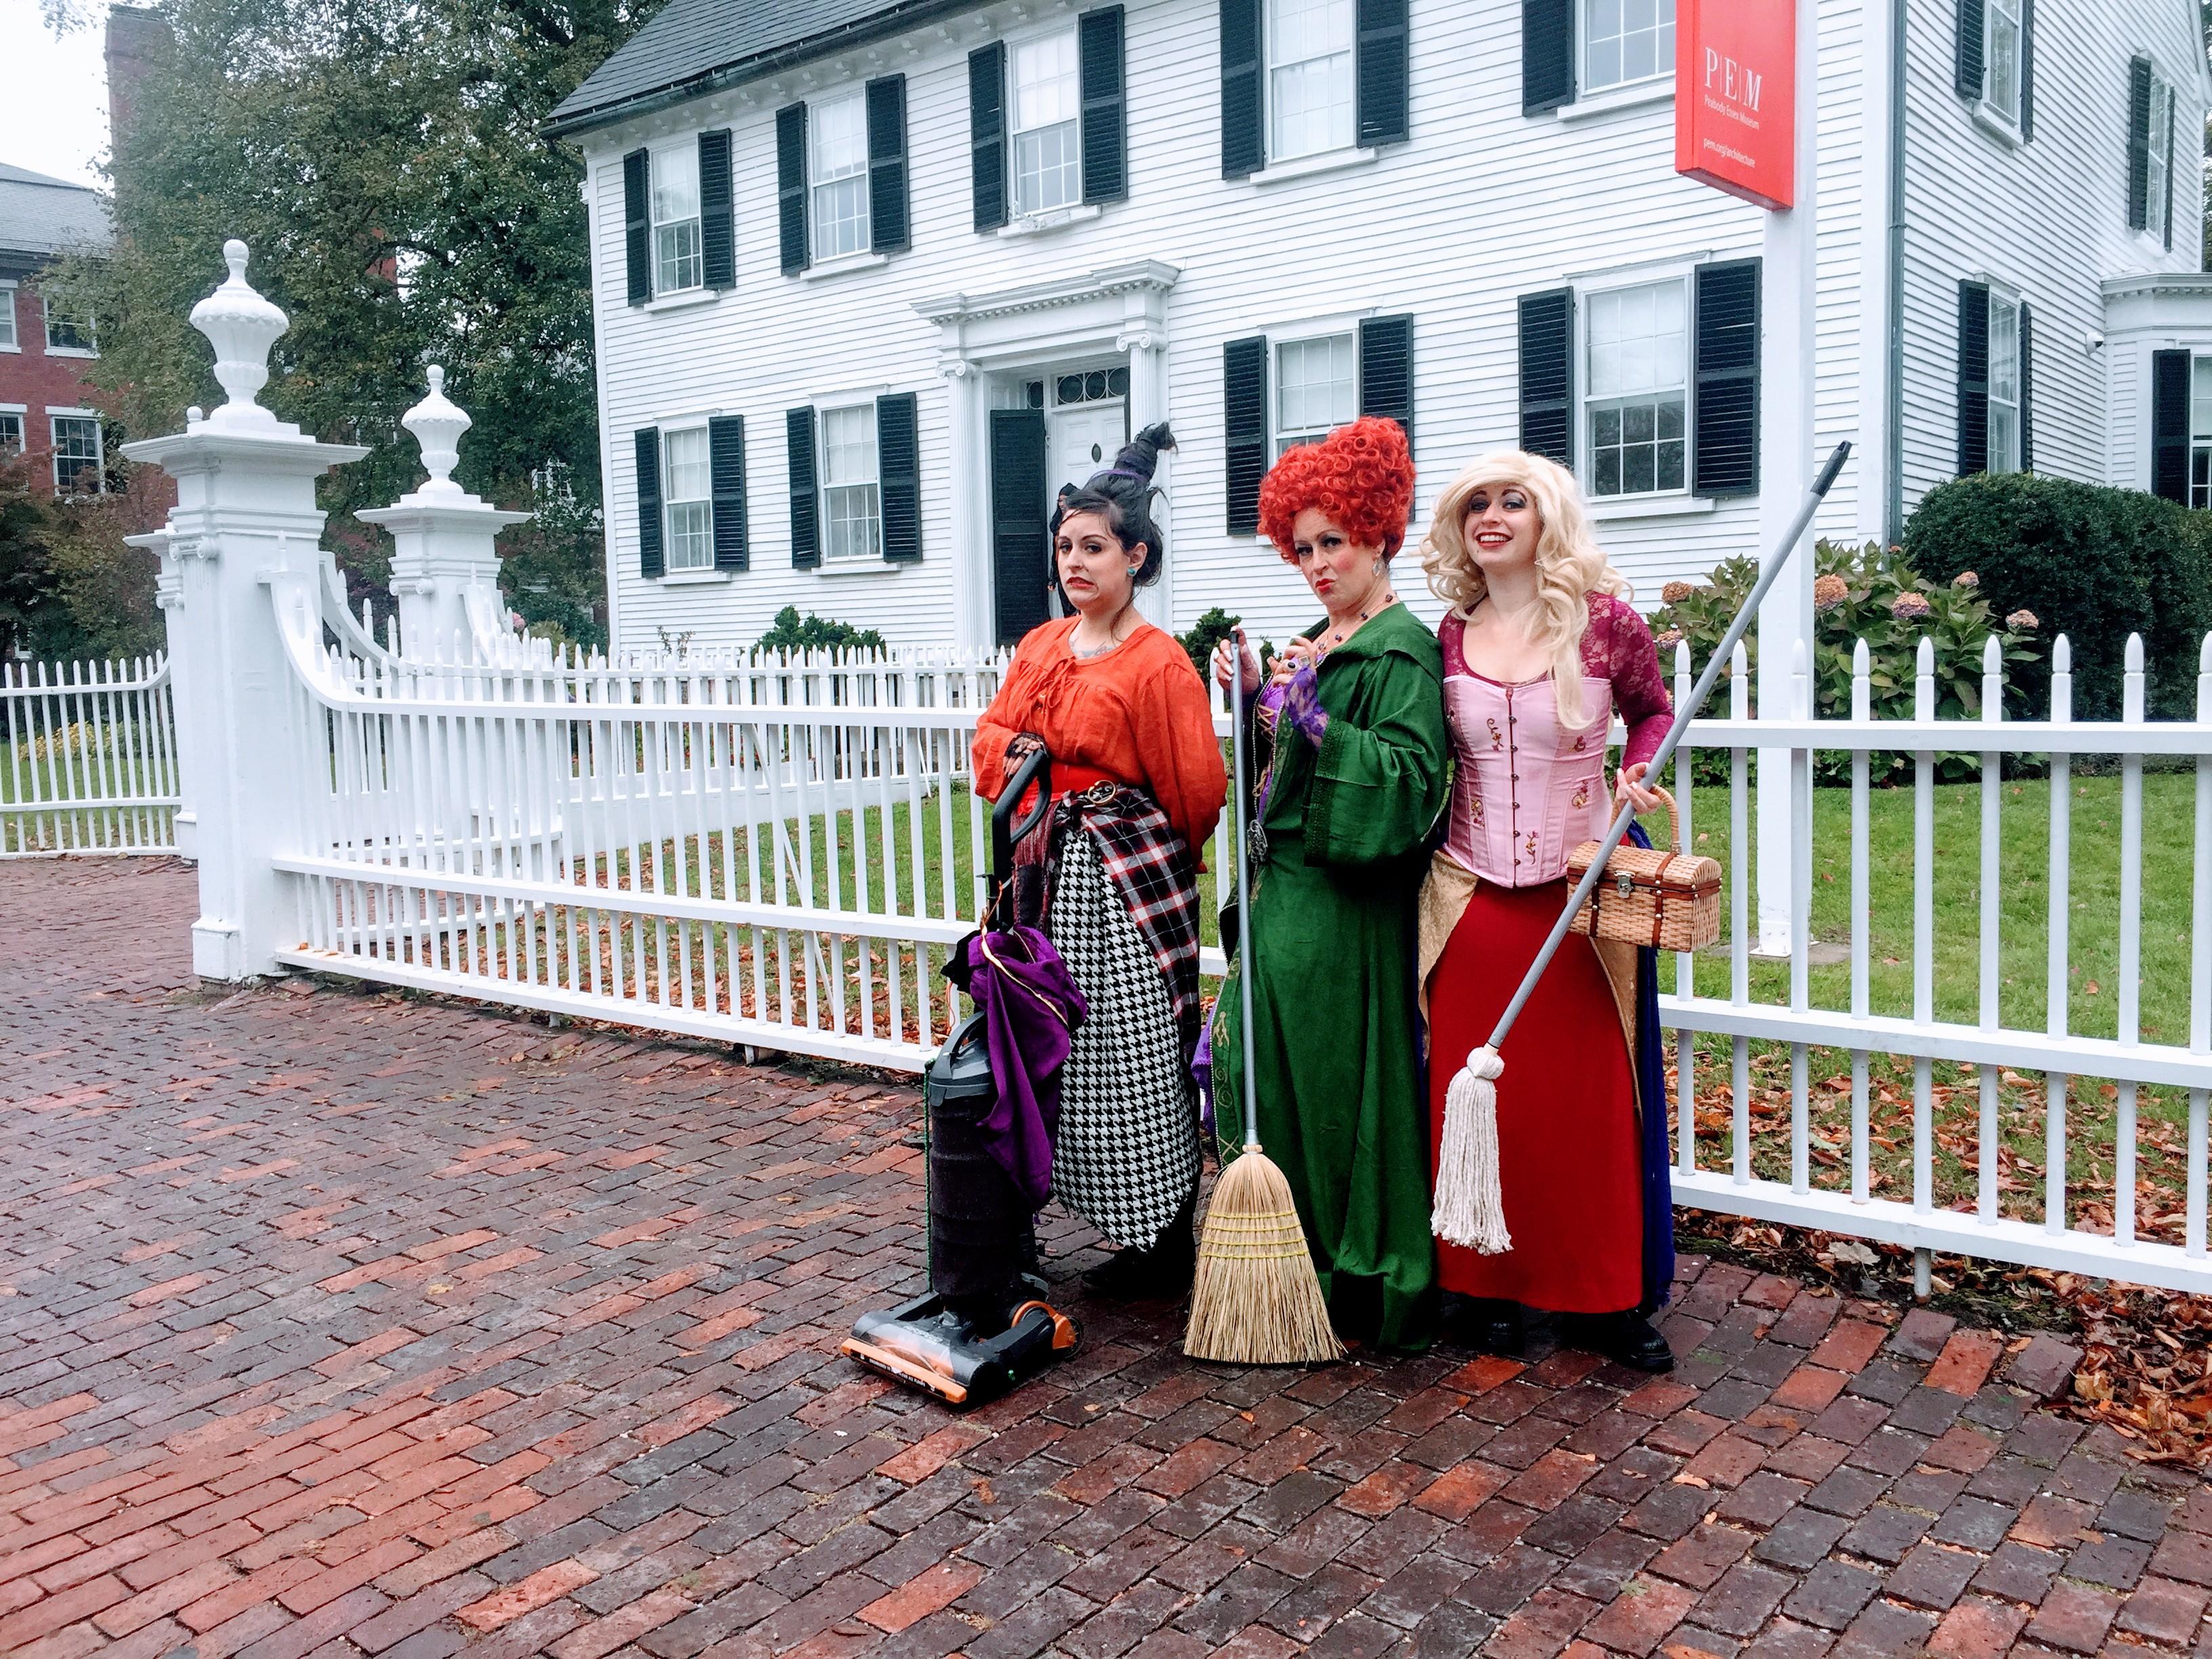 Hocus Pocus and Halloween in Salem, MA | Lostness